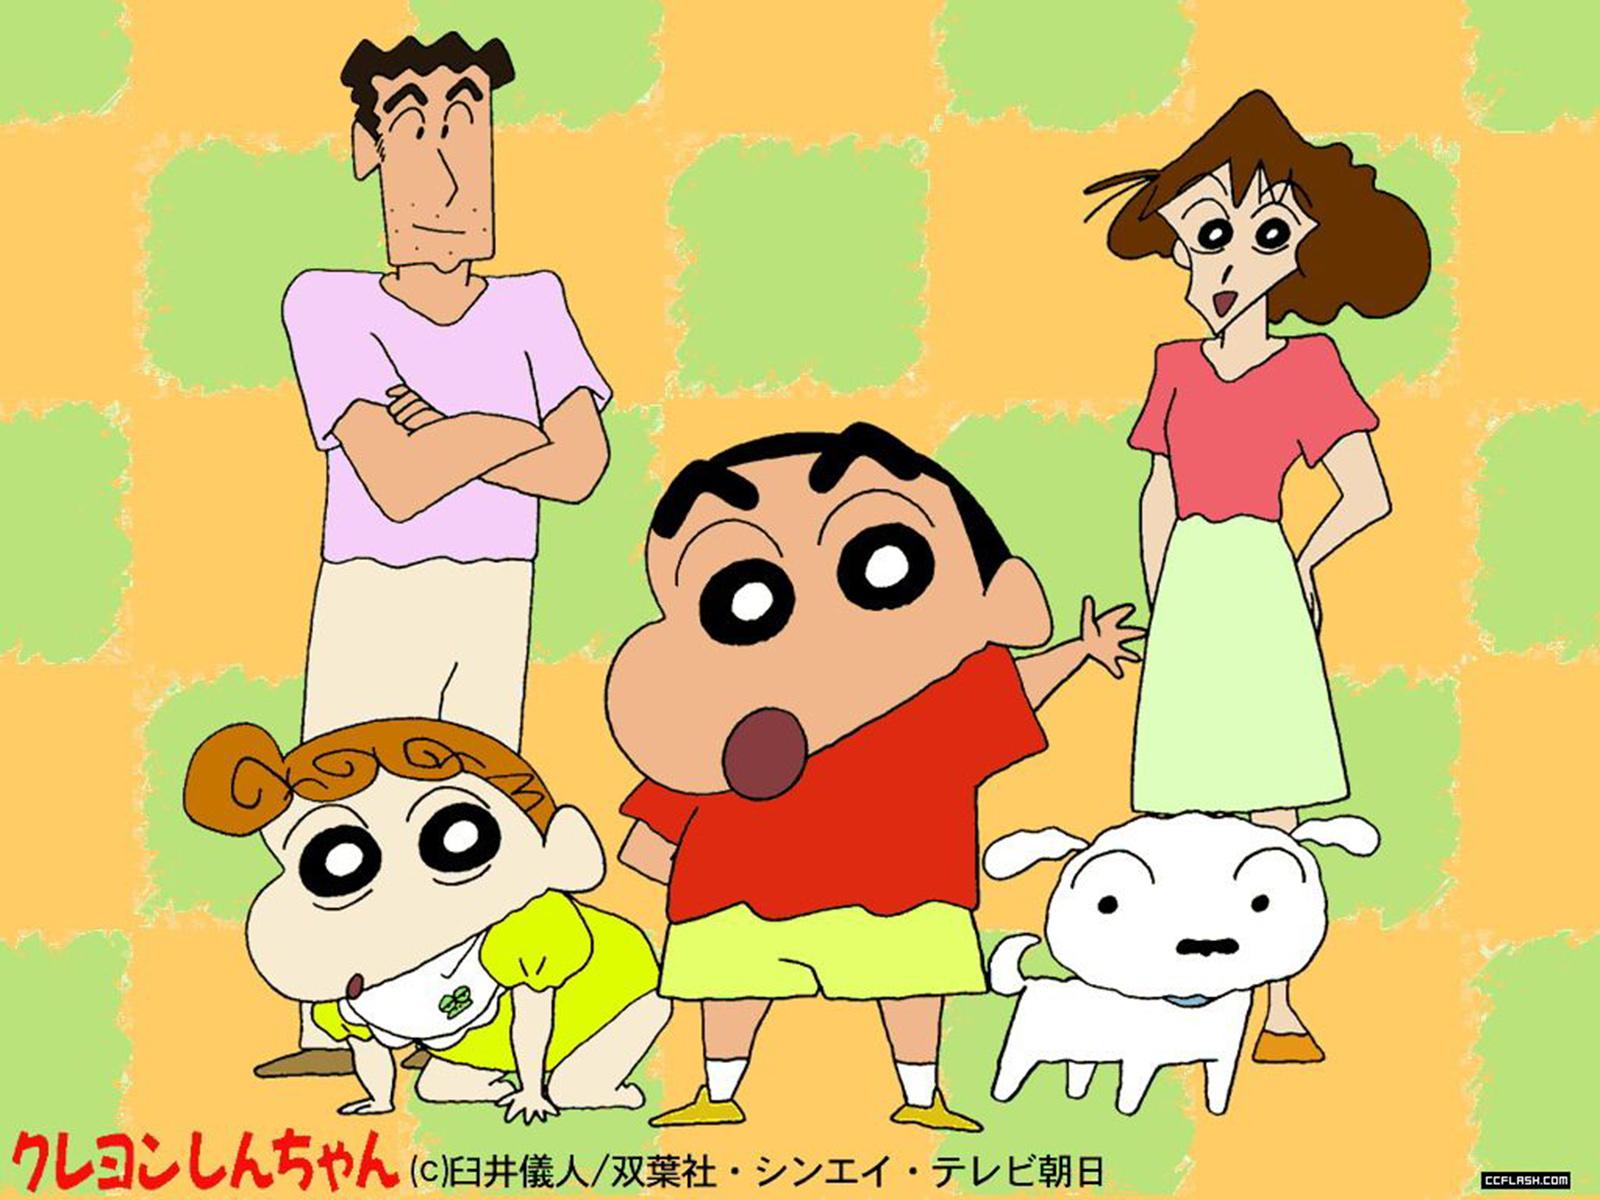 wallpaper de Shin Chan y familia